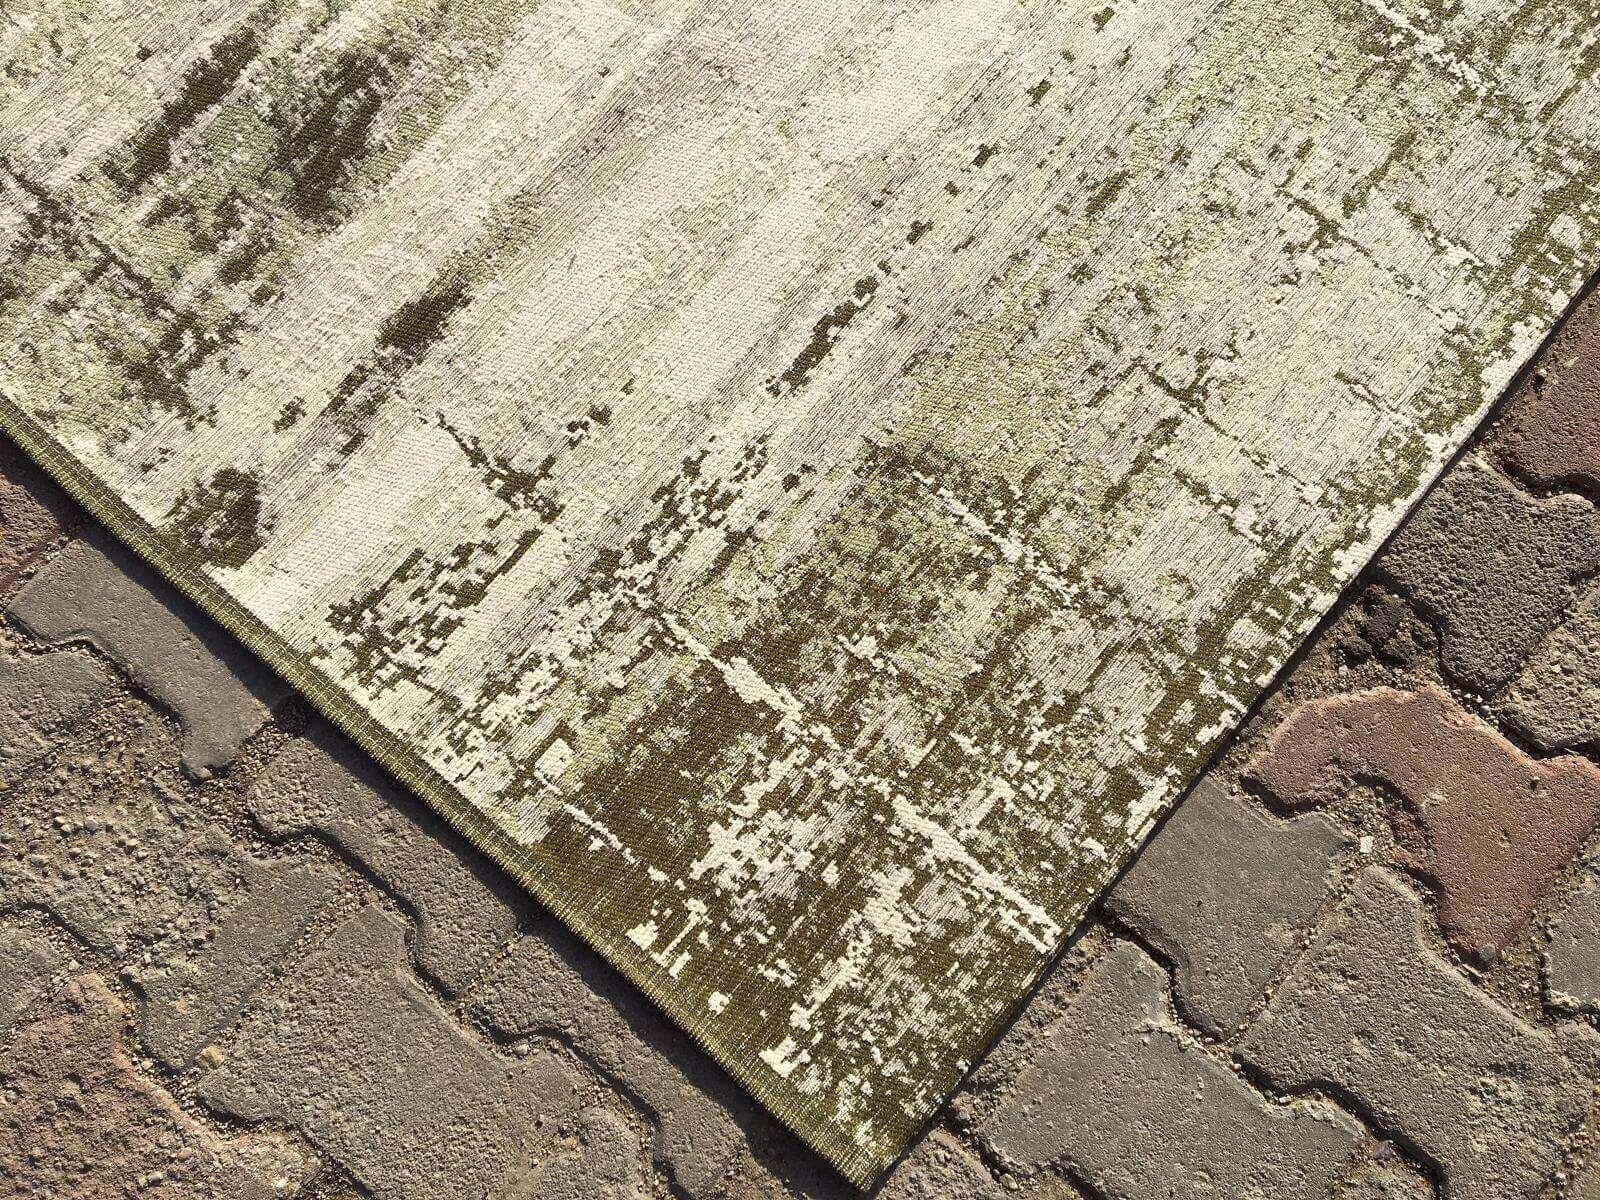 COTTON LÜX KİLİM YEŞİL 120X180 Cotton Lux Kilim Dekoratif Kilim